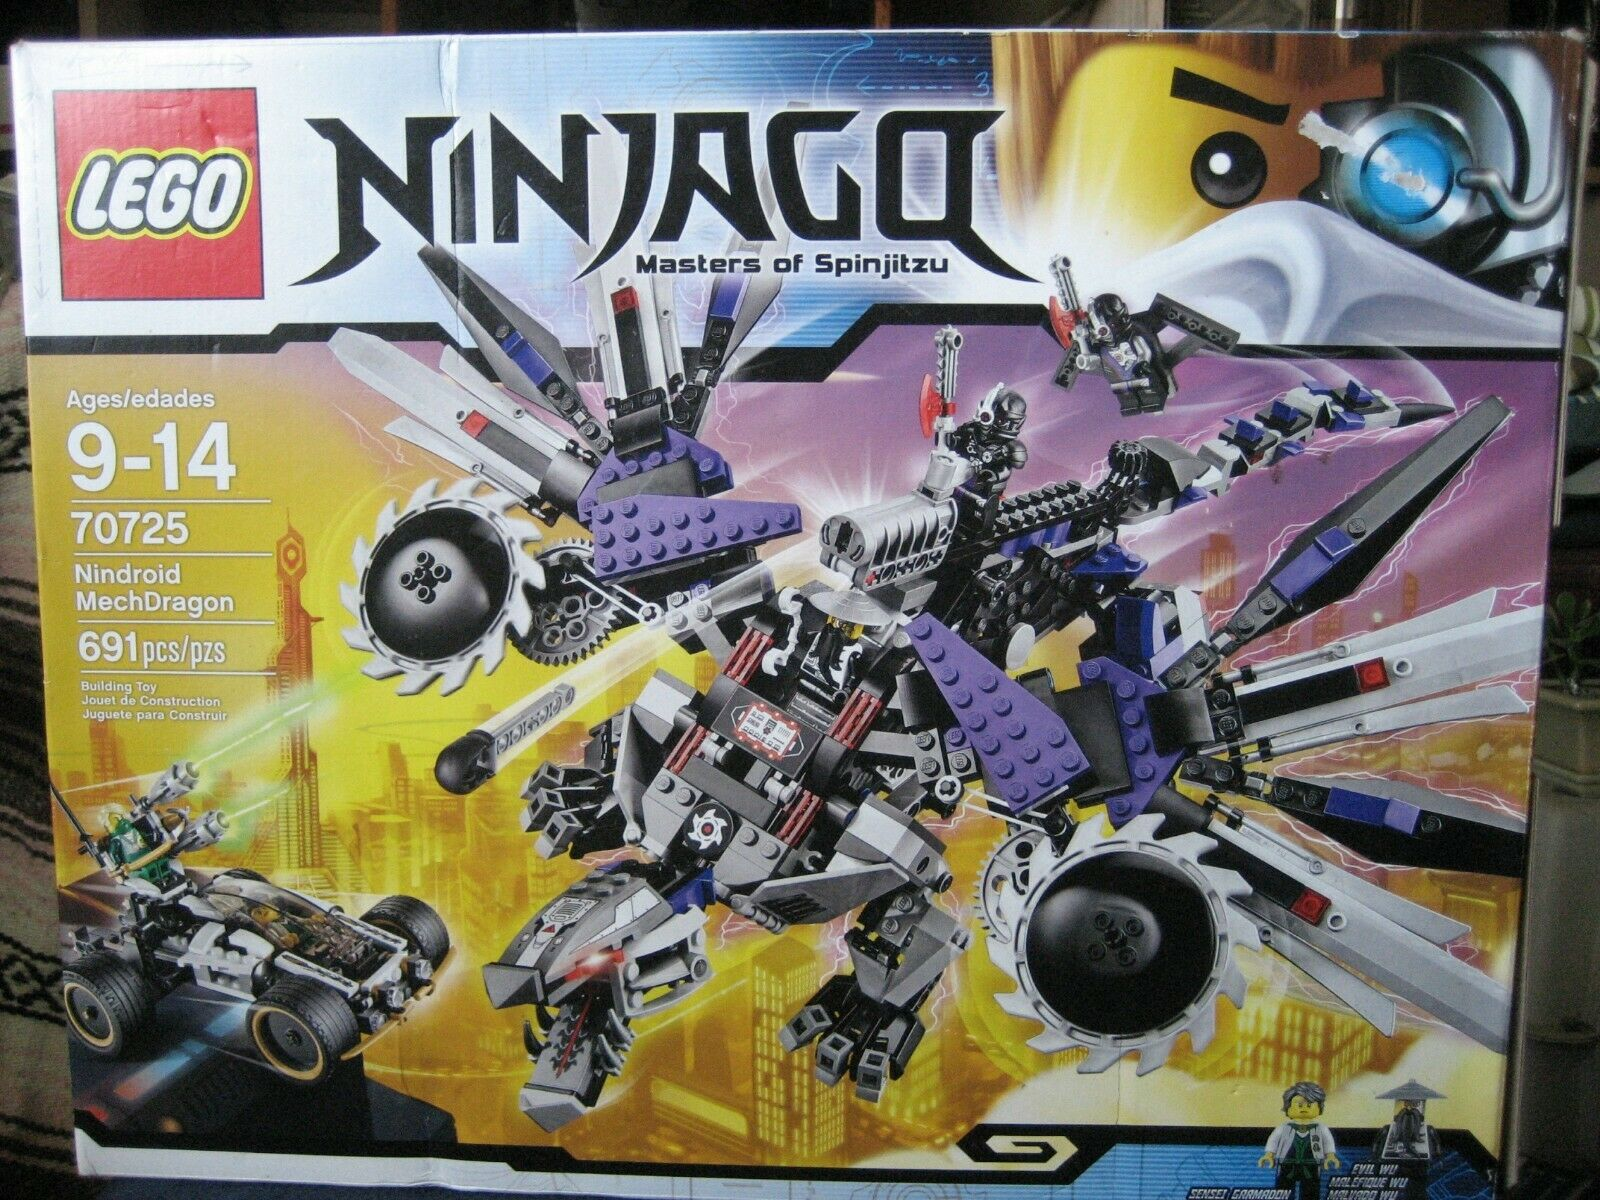 LEGO Ninjago Master of Spinjitzu  Nindroid MechDragon  70725......NEW